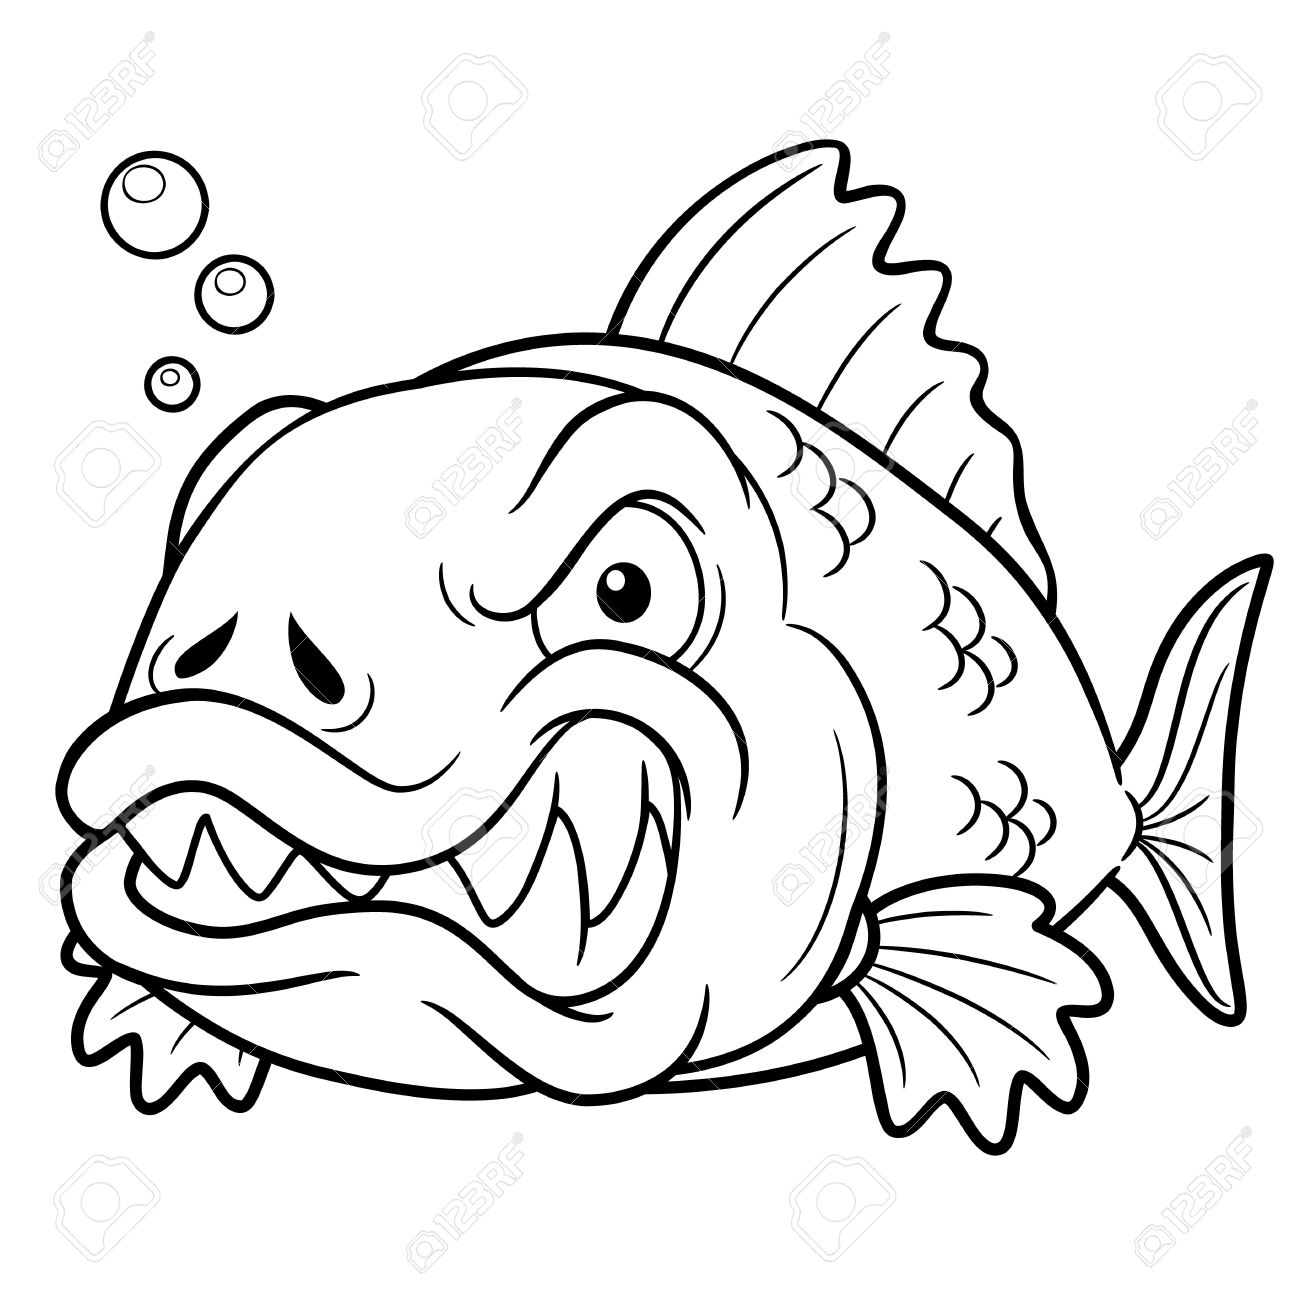 illustration of angry fish cartoon coloring book royalty free